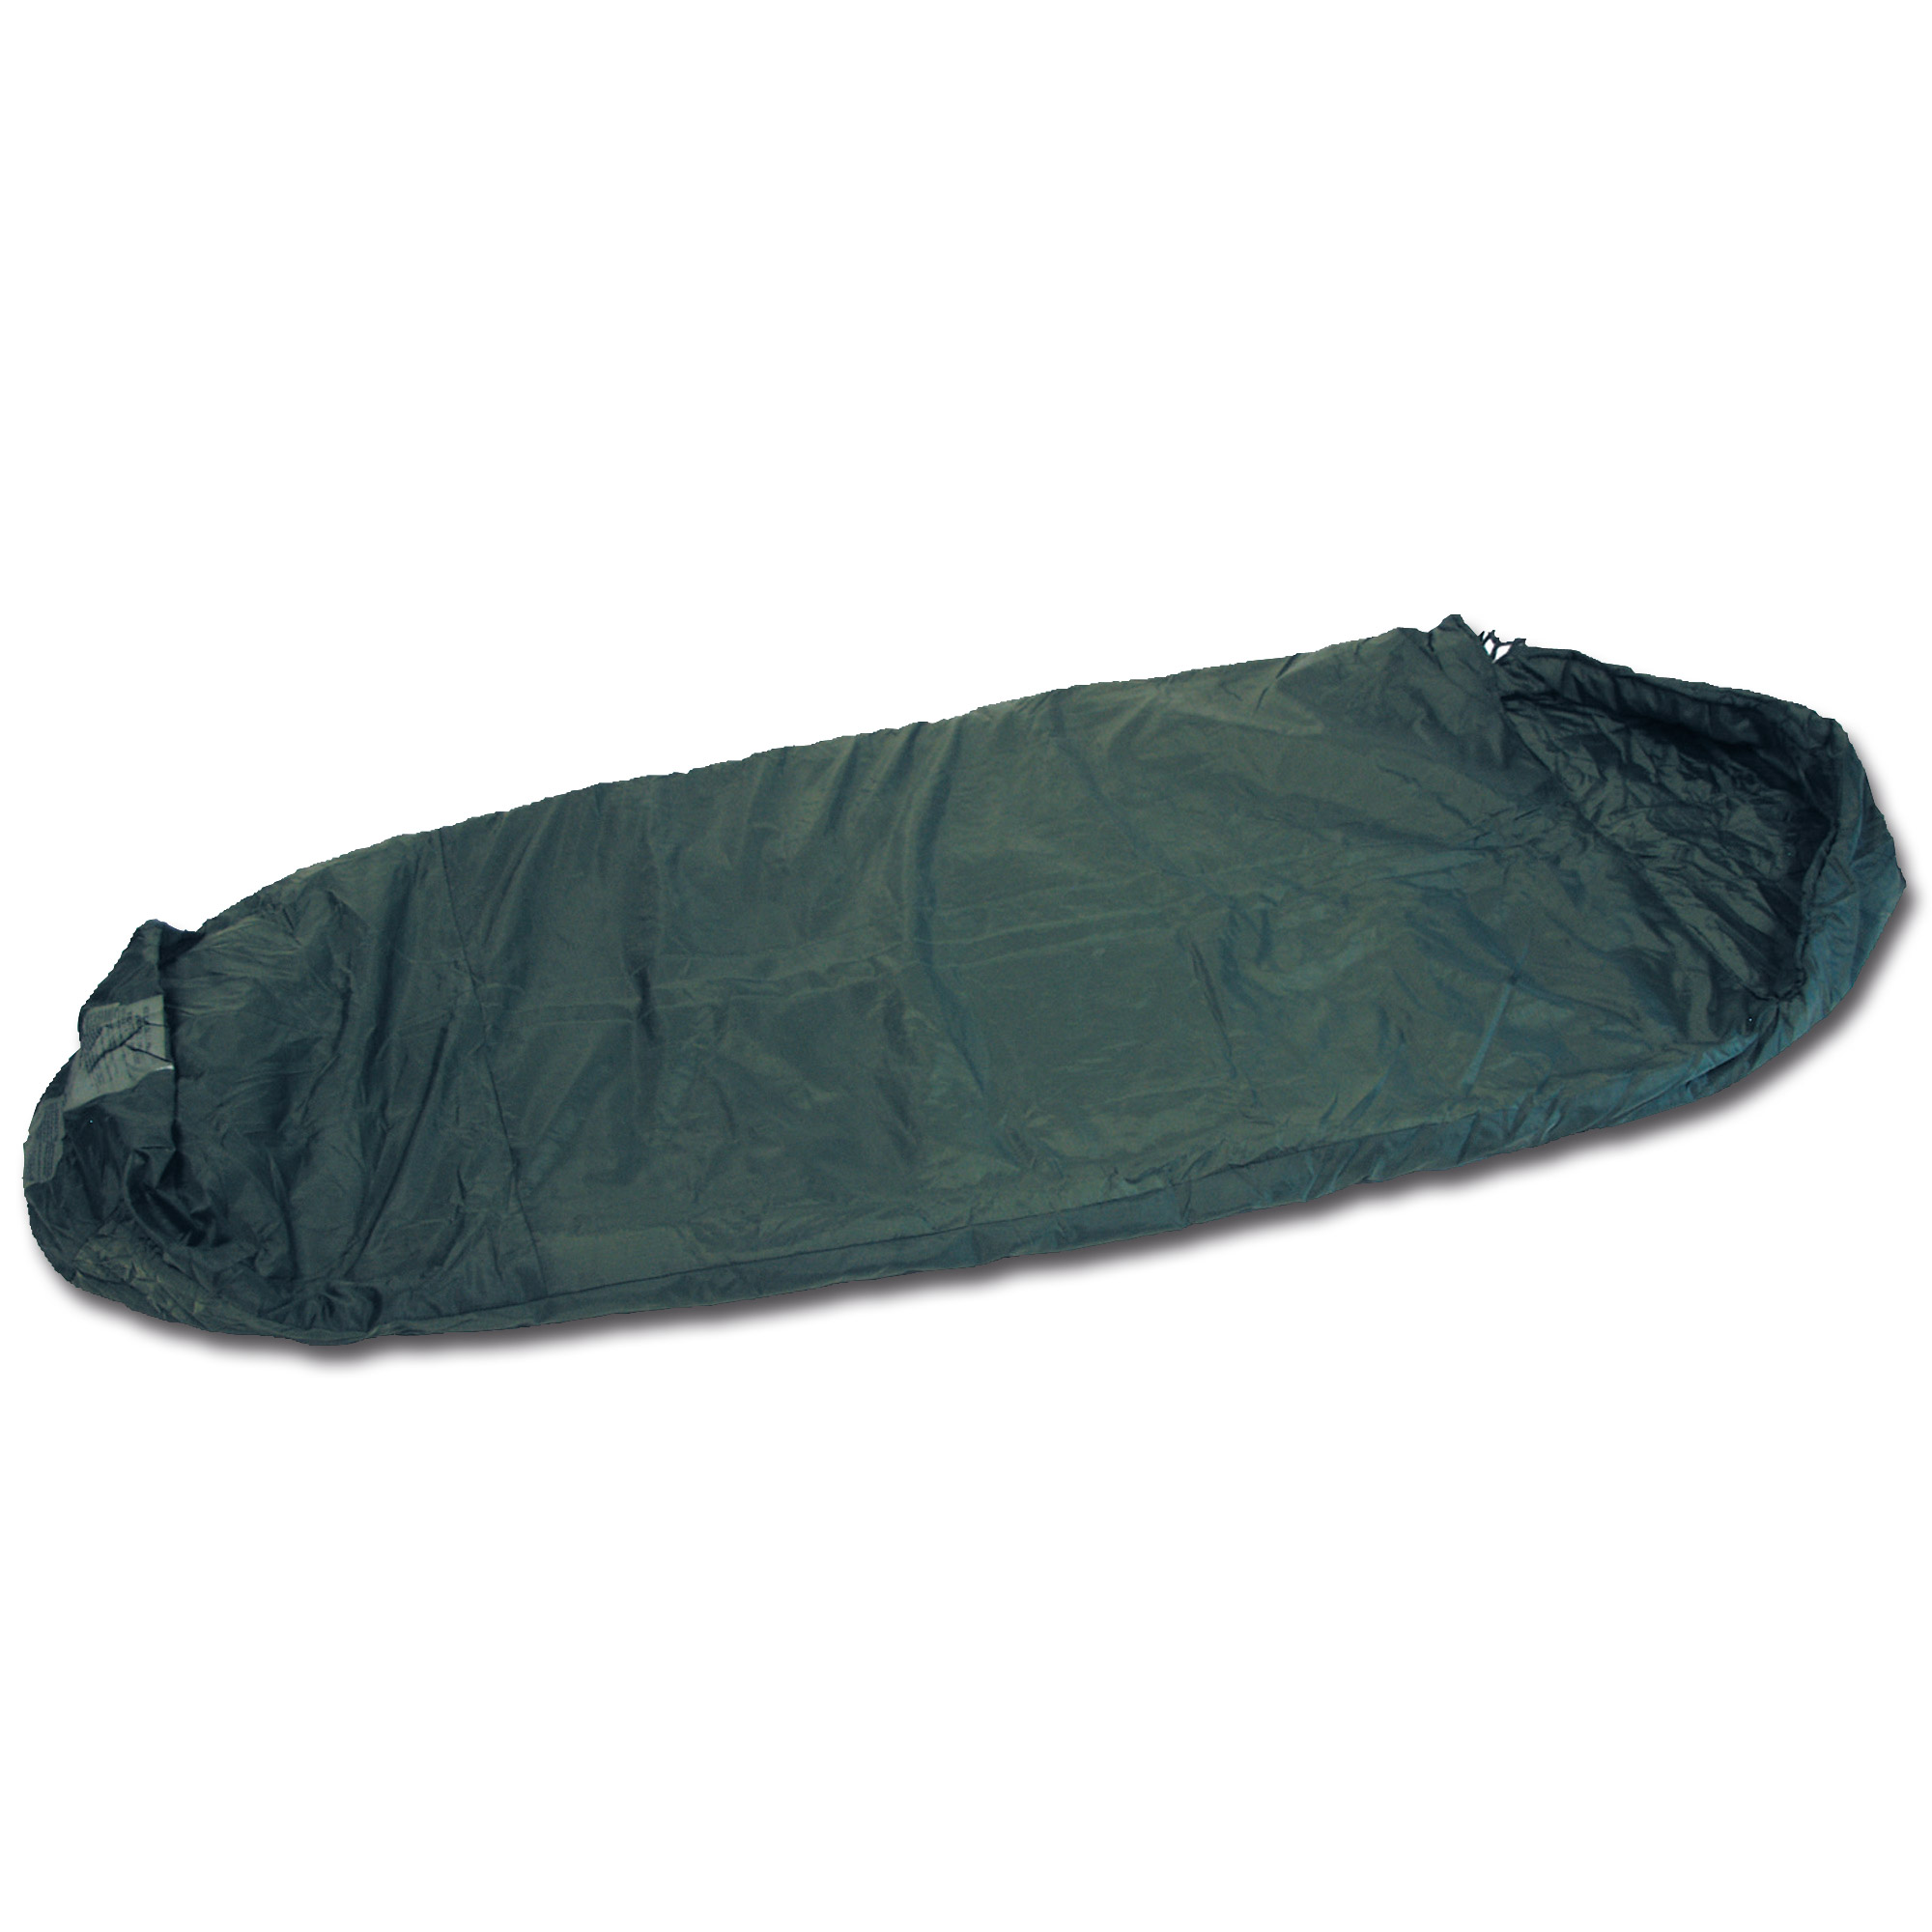 GI Modular Sleeping System Summer Bag petrol green | GI ...